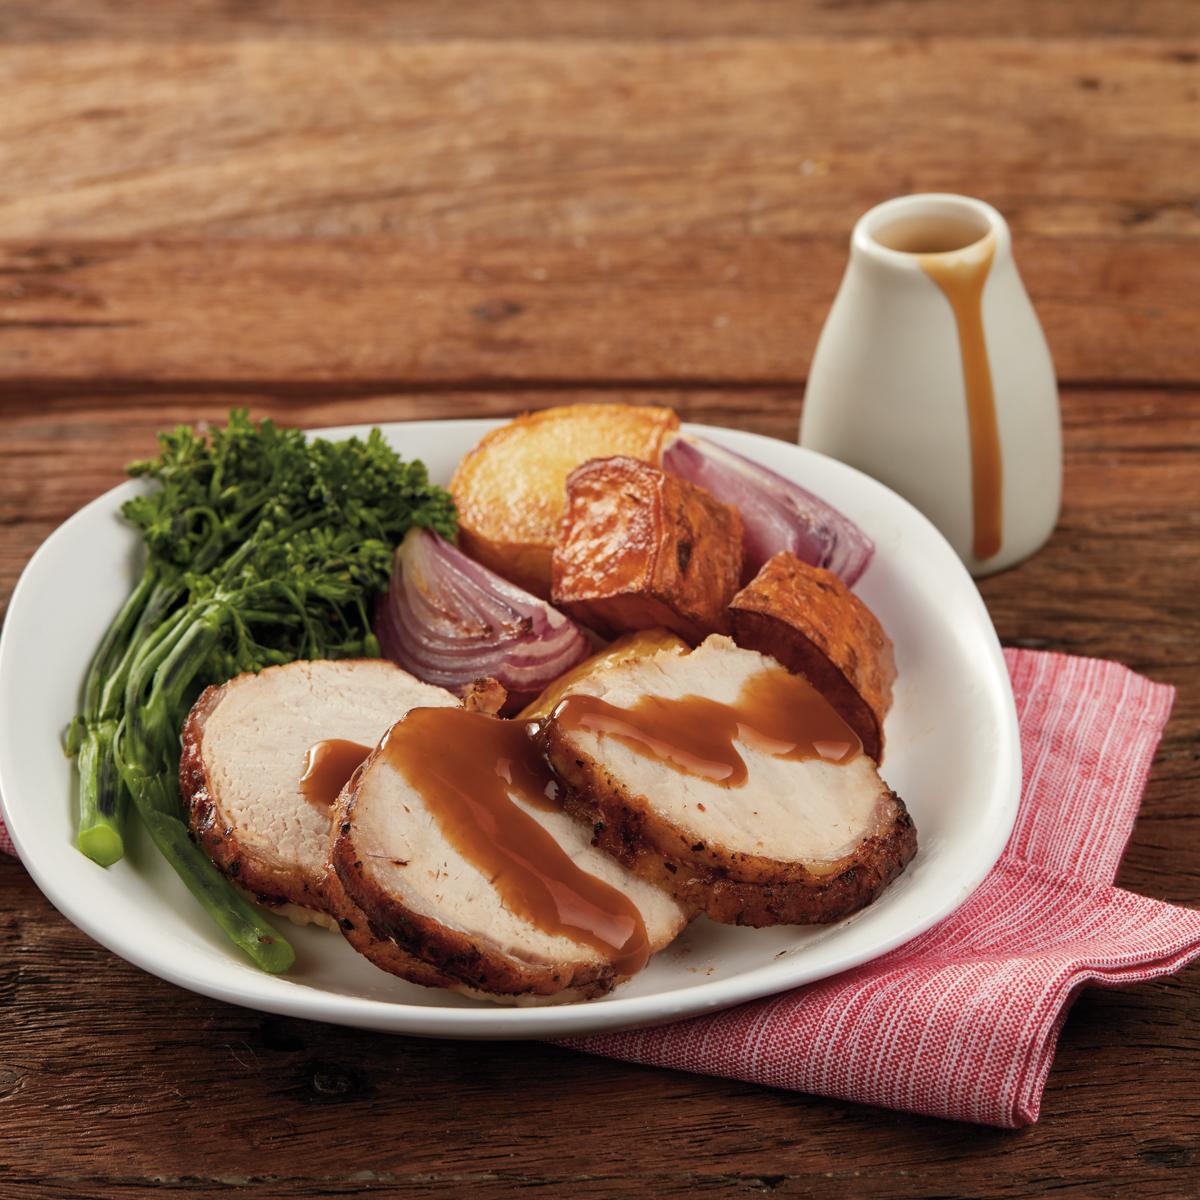 Mini Roast with Onion Gravy & charred broccolini - SunPork Mini Roast with rich onion gravy